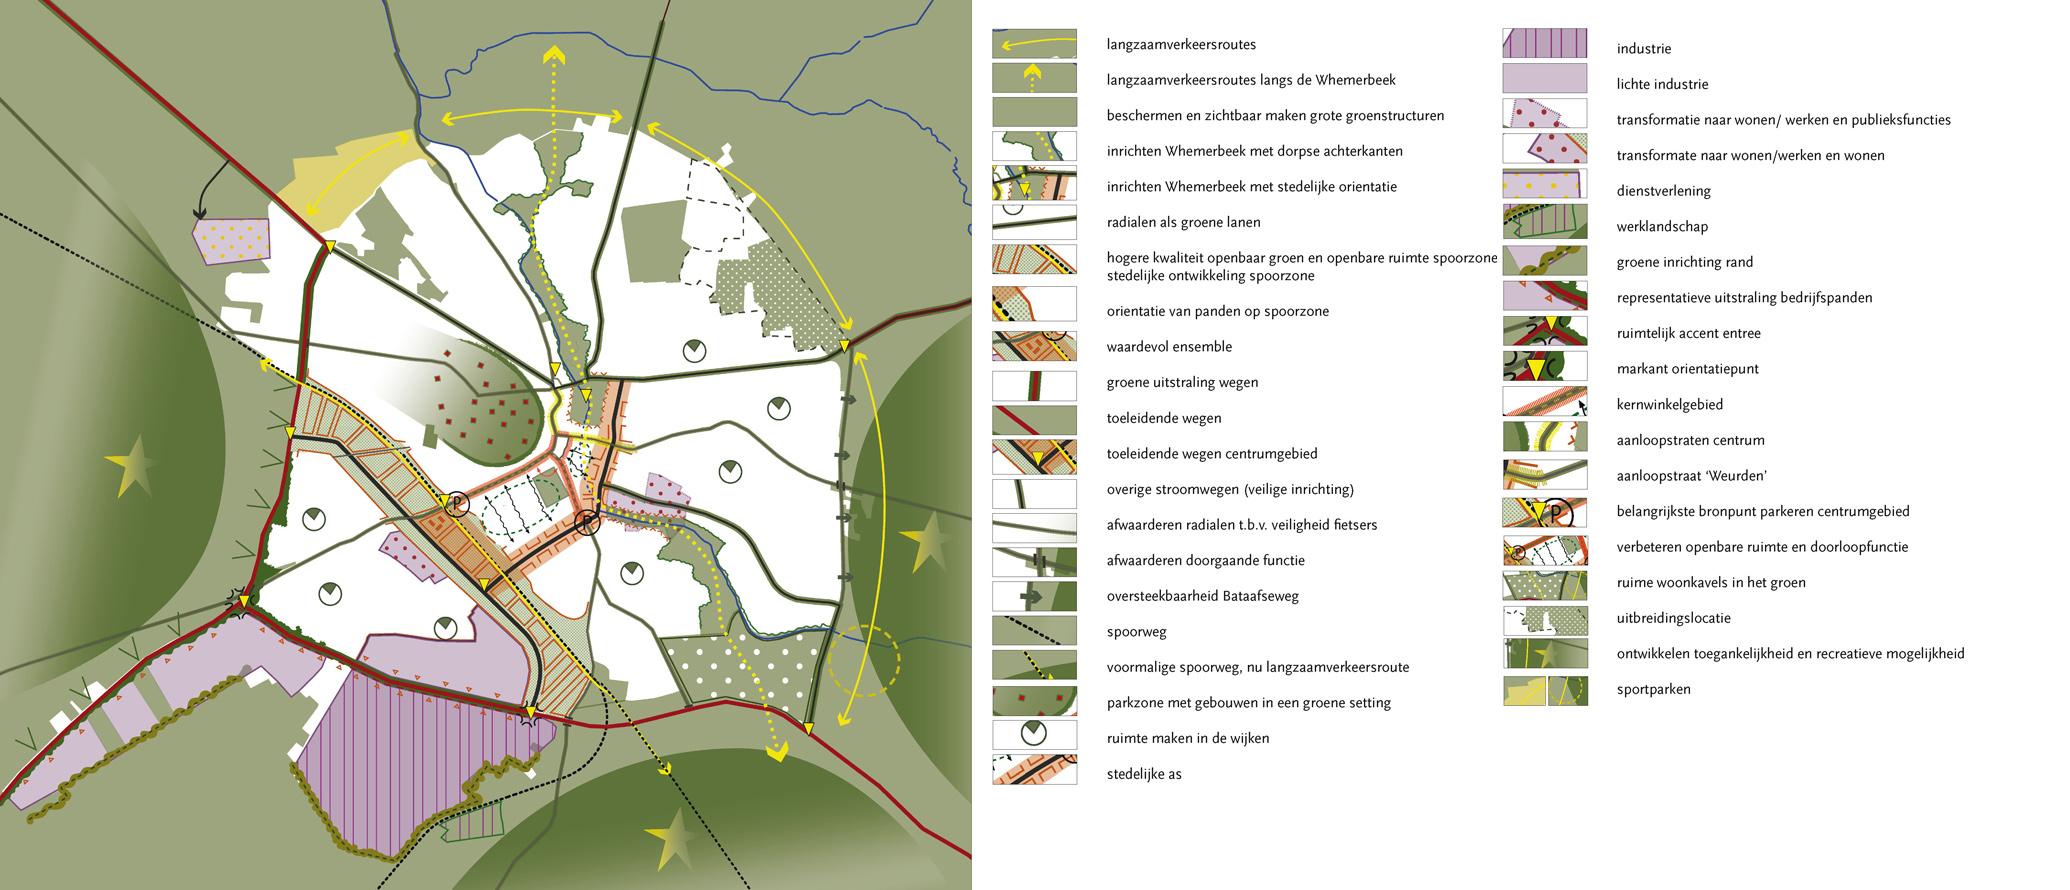 Winterswijk